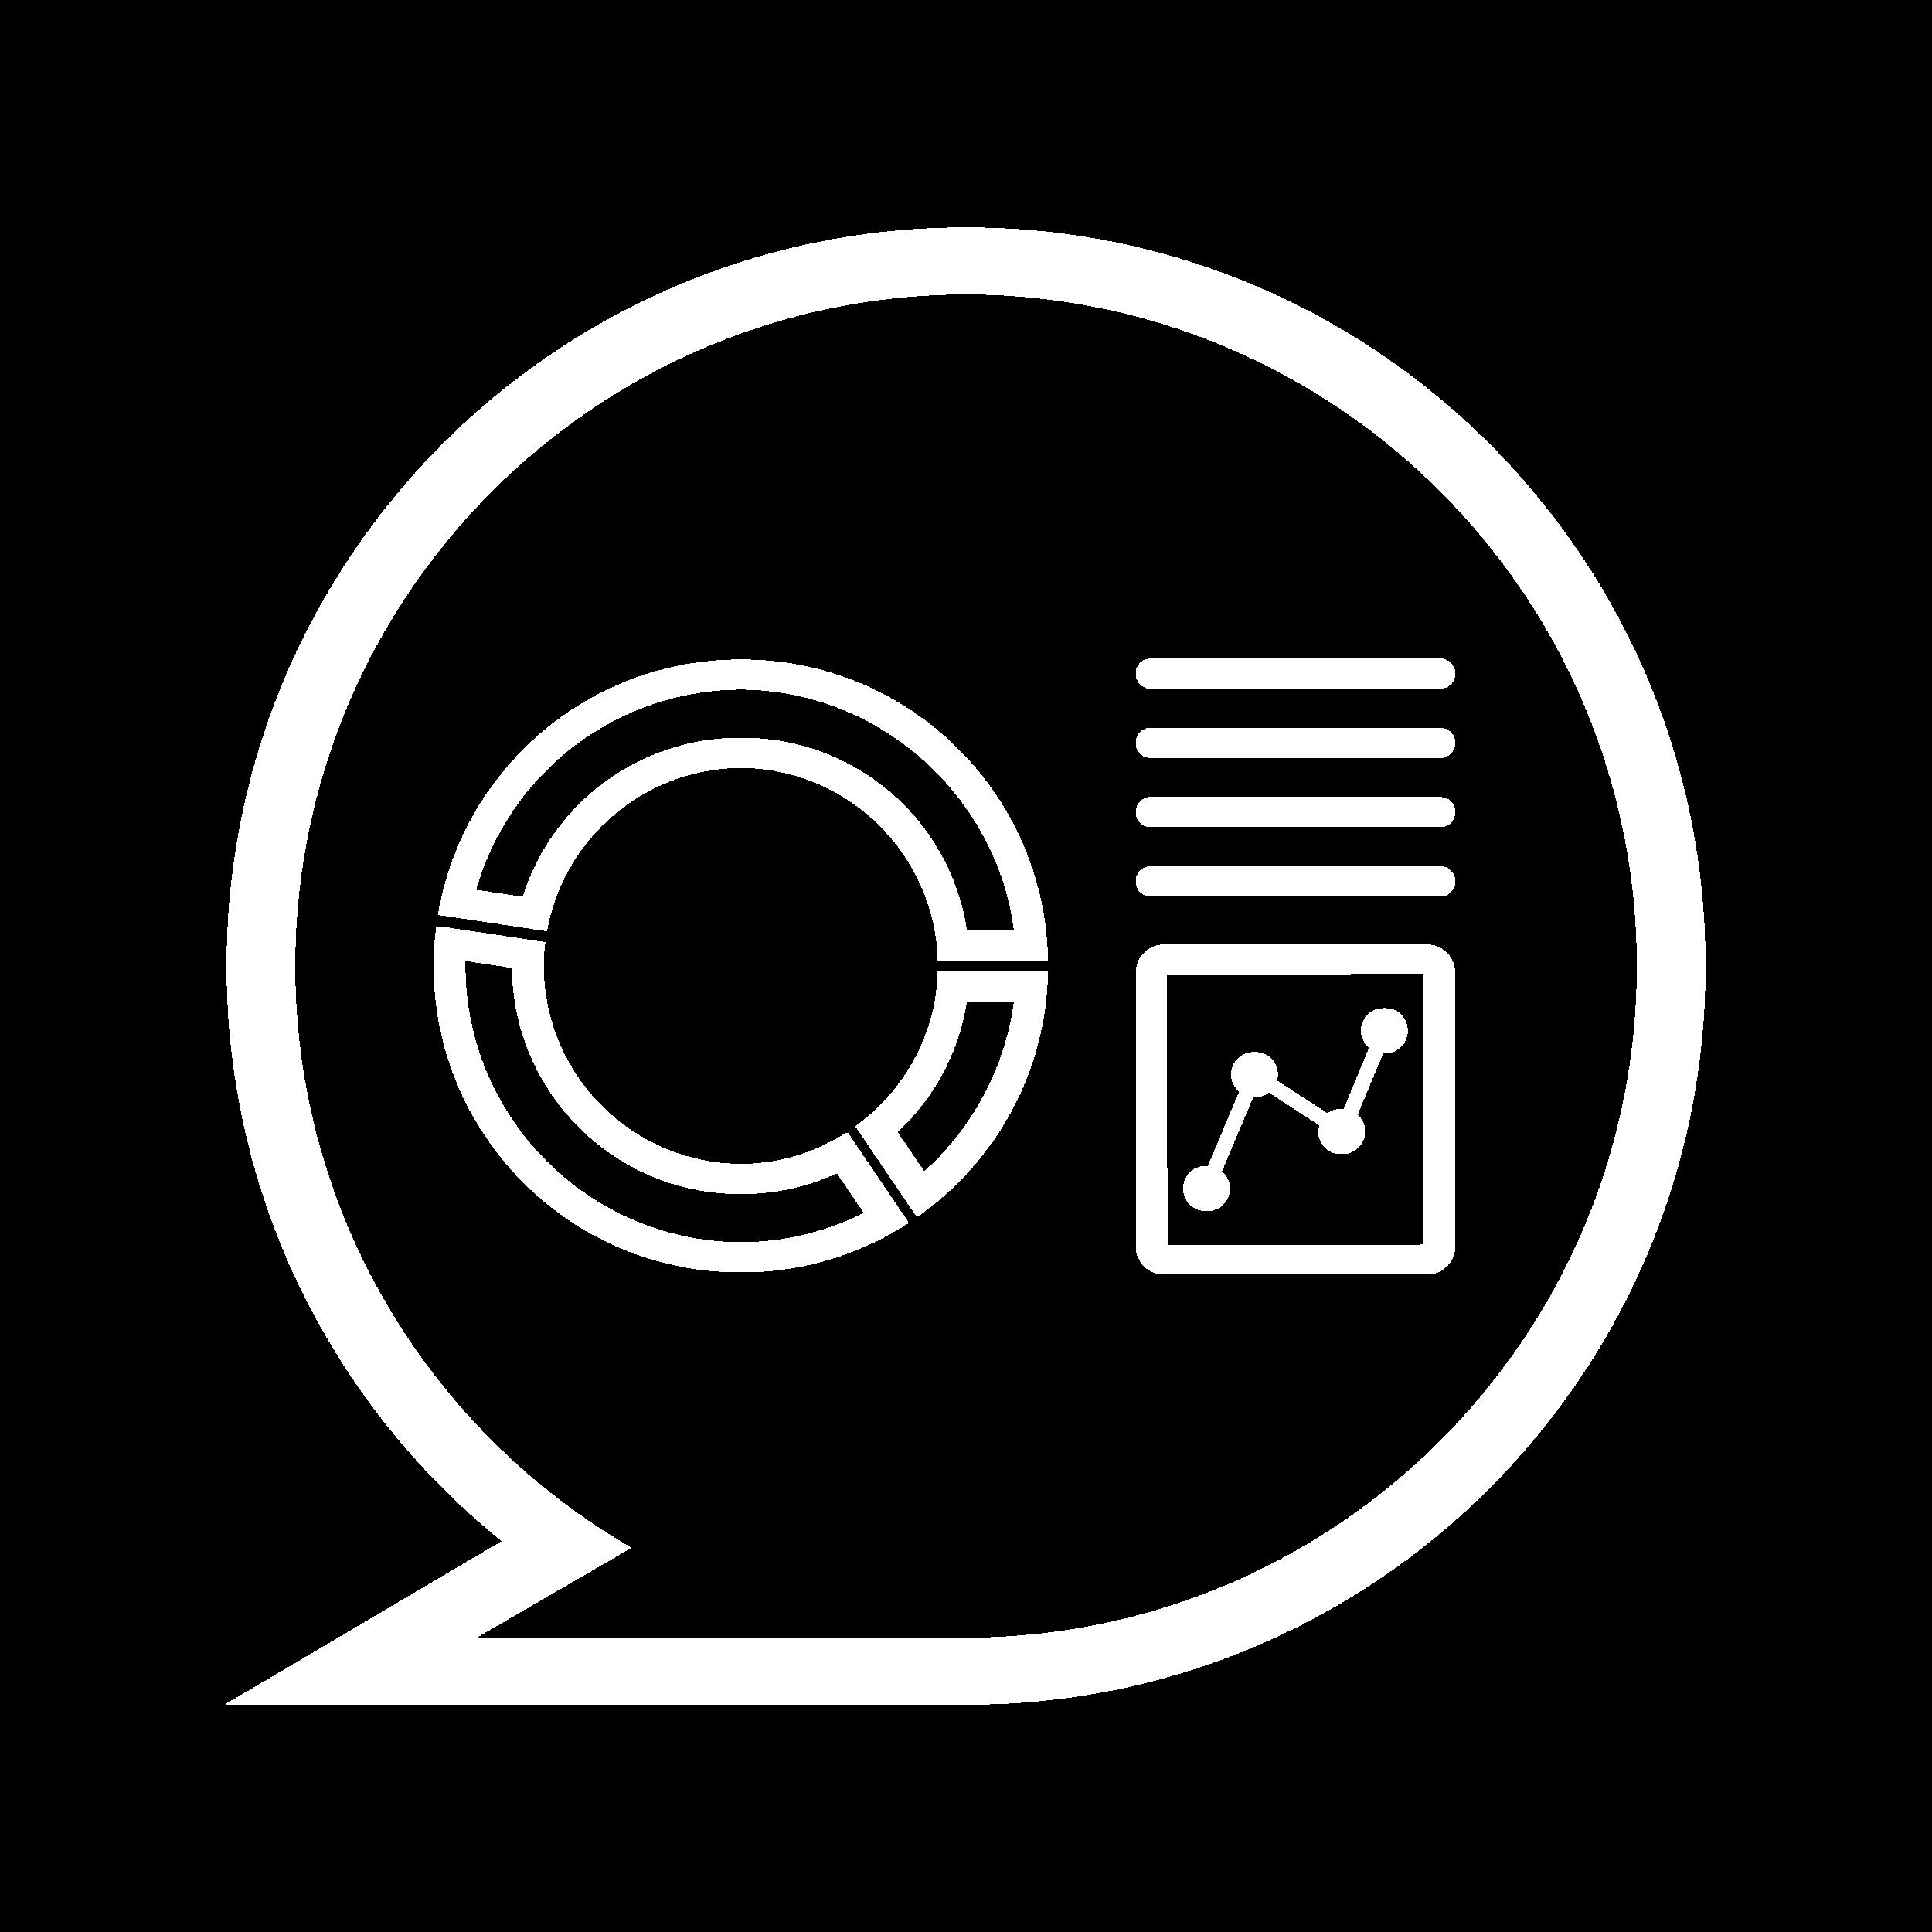 metrics_DDO_white.png